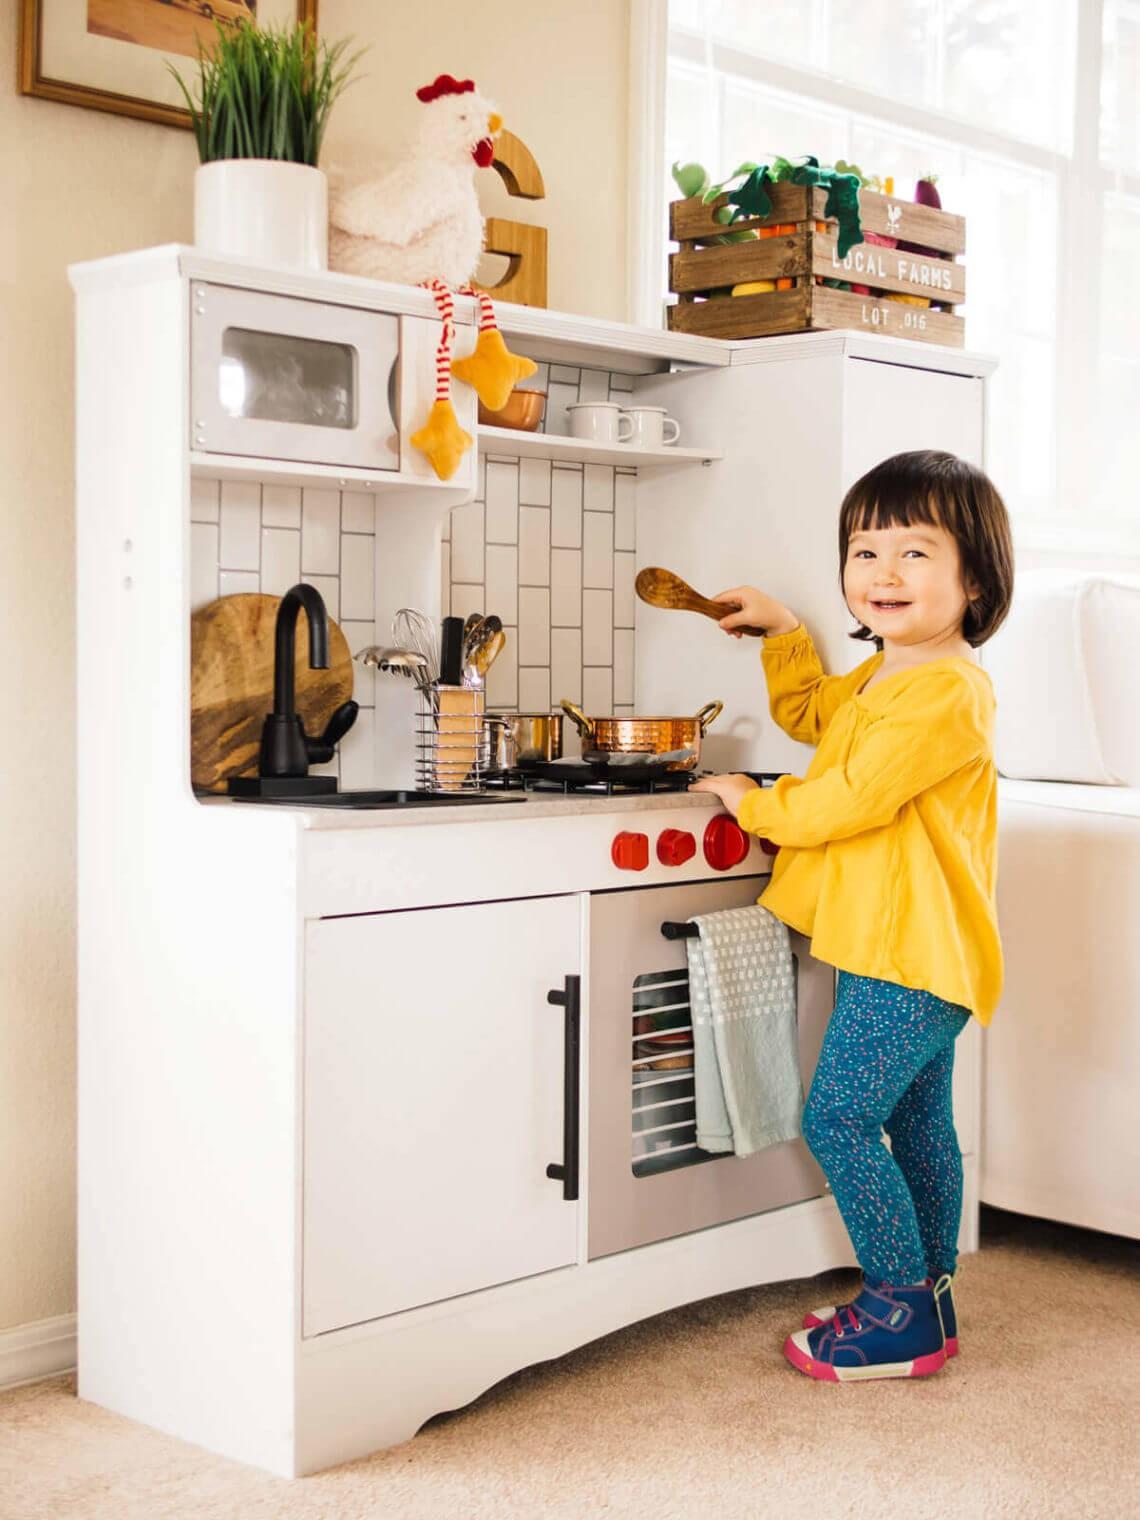 16. DIY Realistic Play Kitchen